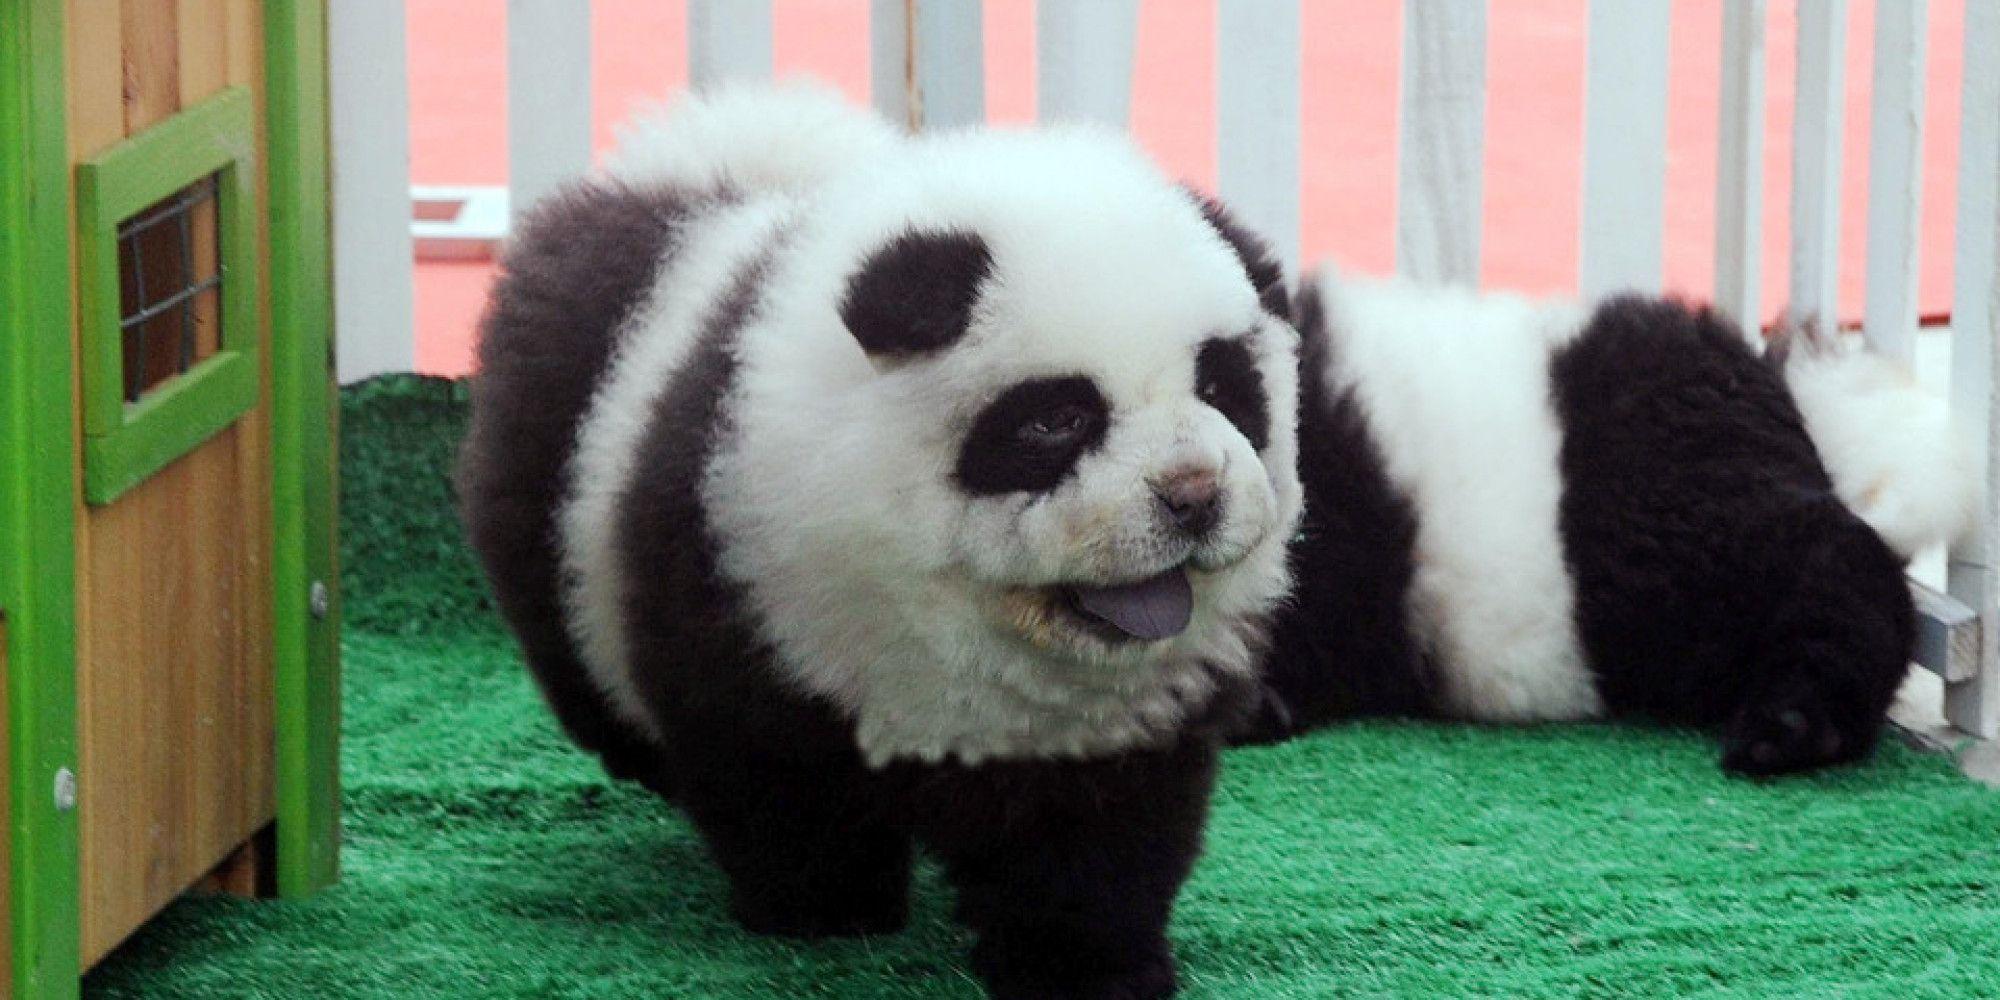 Look Panda Dogs Are The New Regular Dogs Panda Puppy Panda Dog